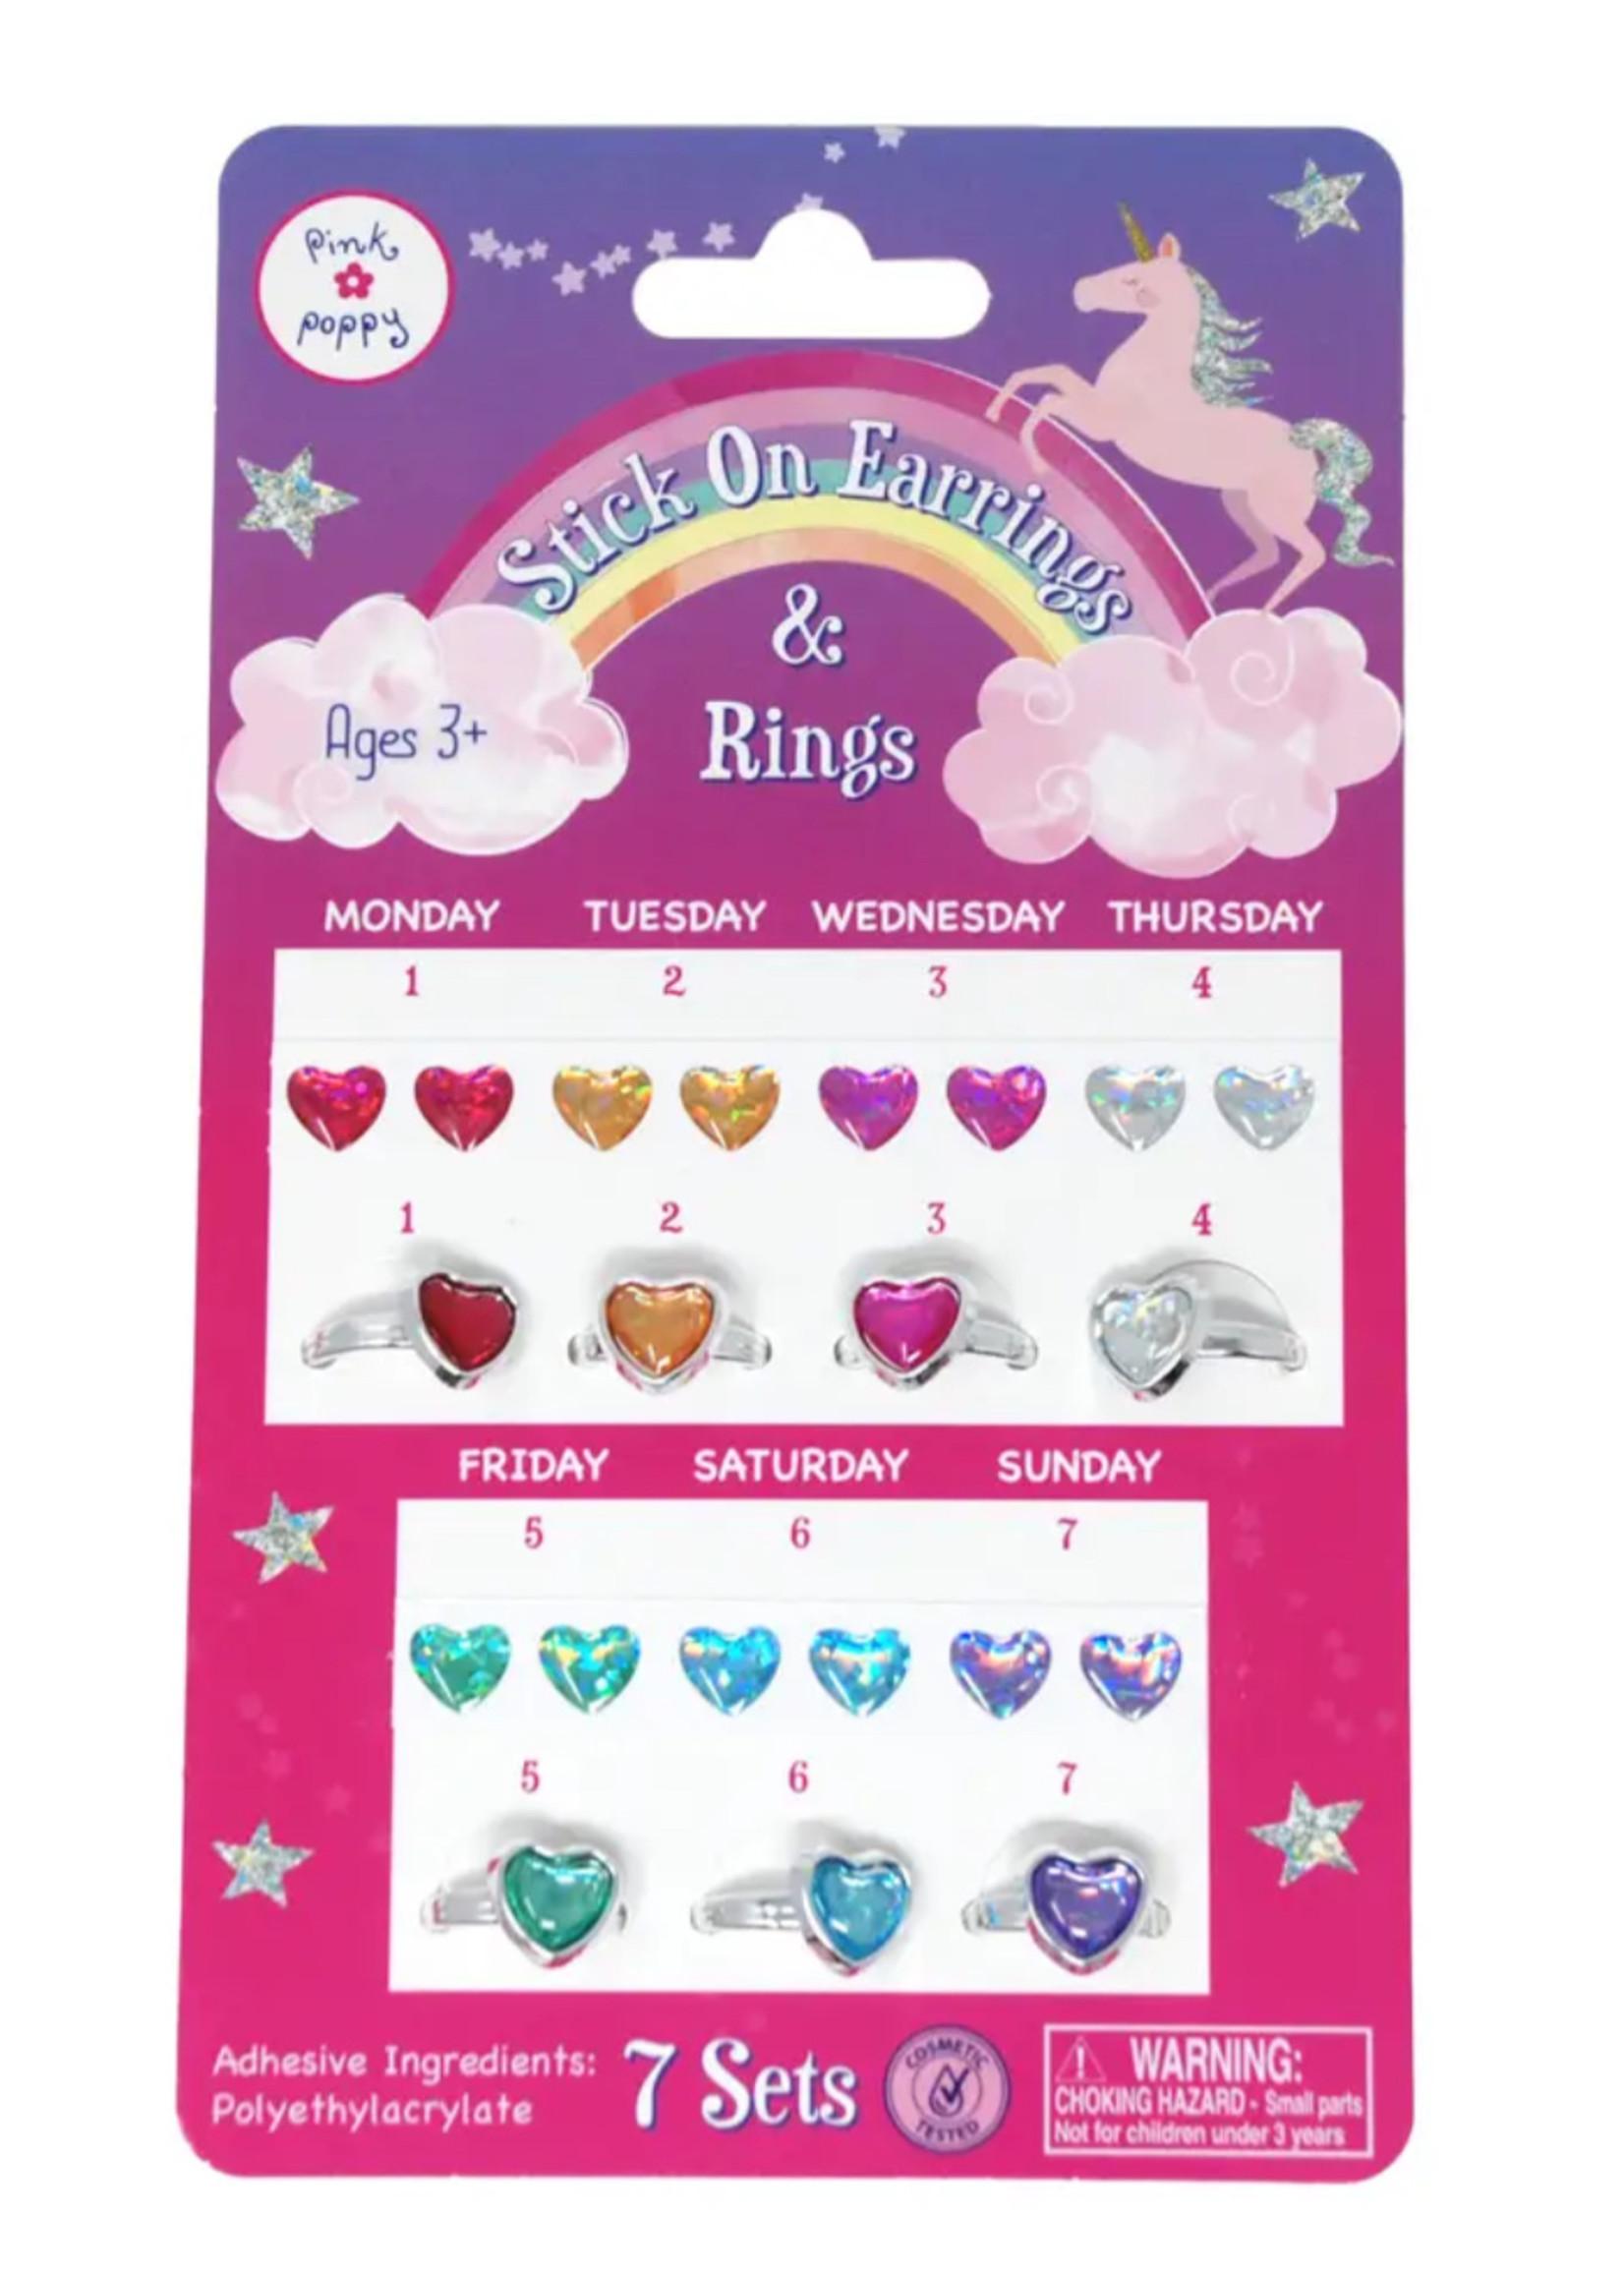 Pink Poppy 7 day Stick on Earrings & Ring Set